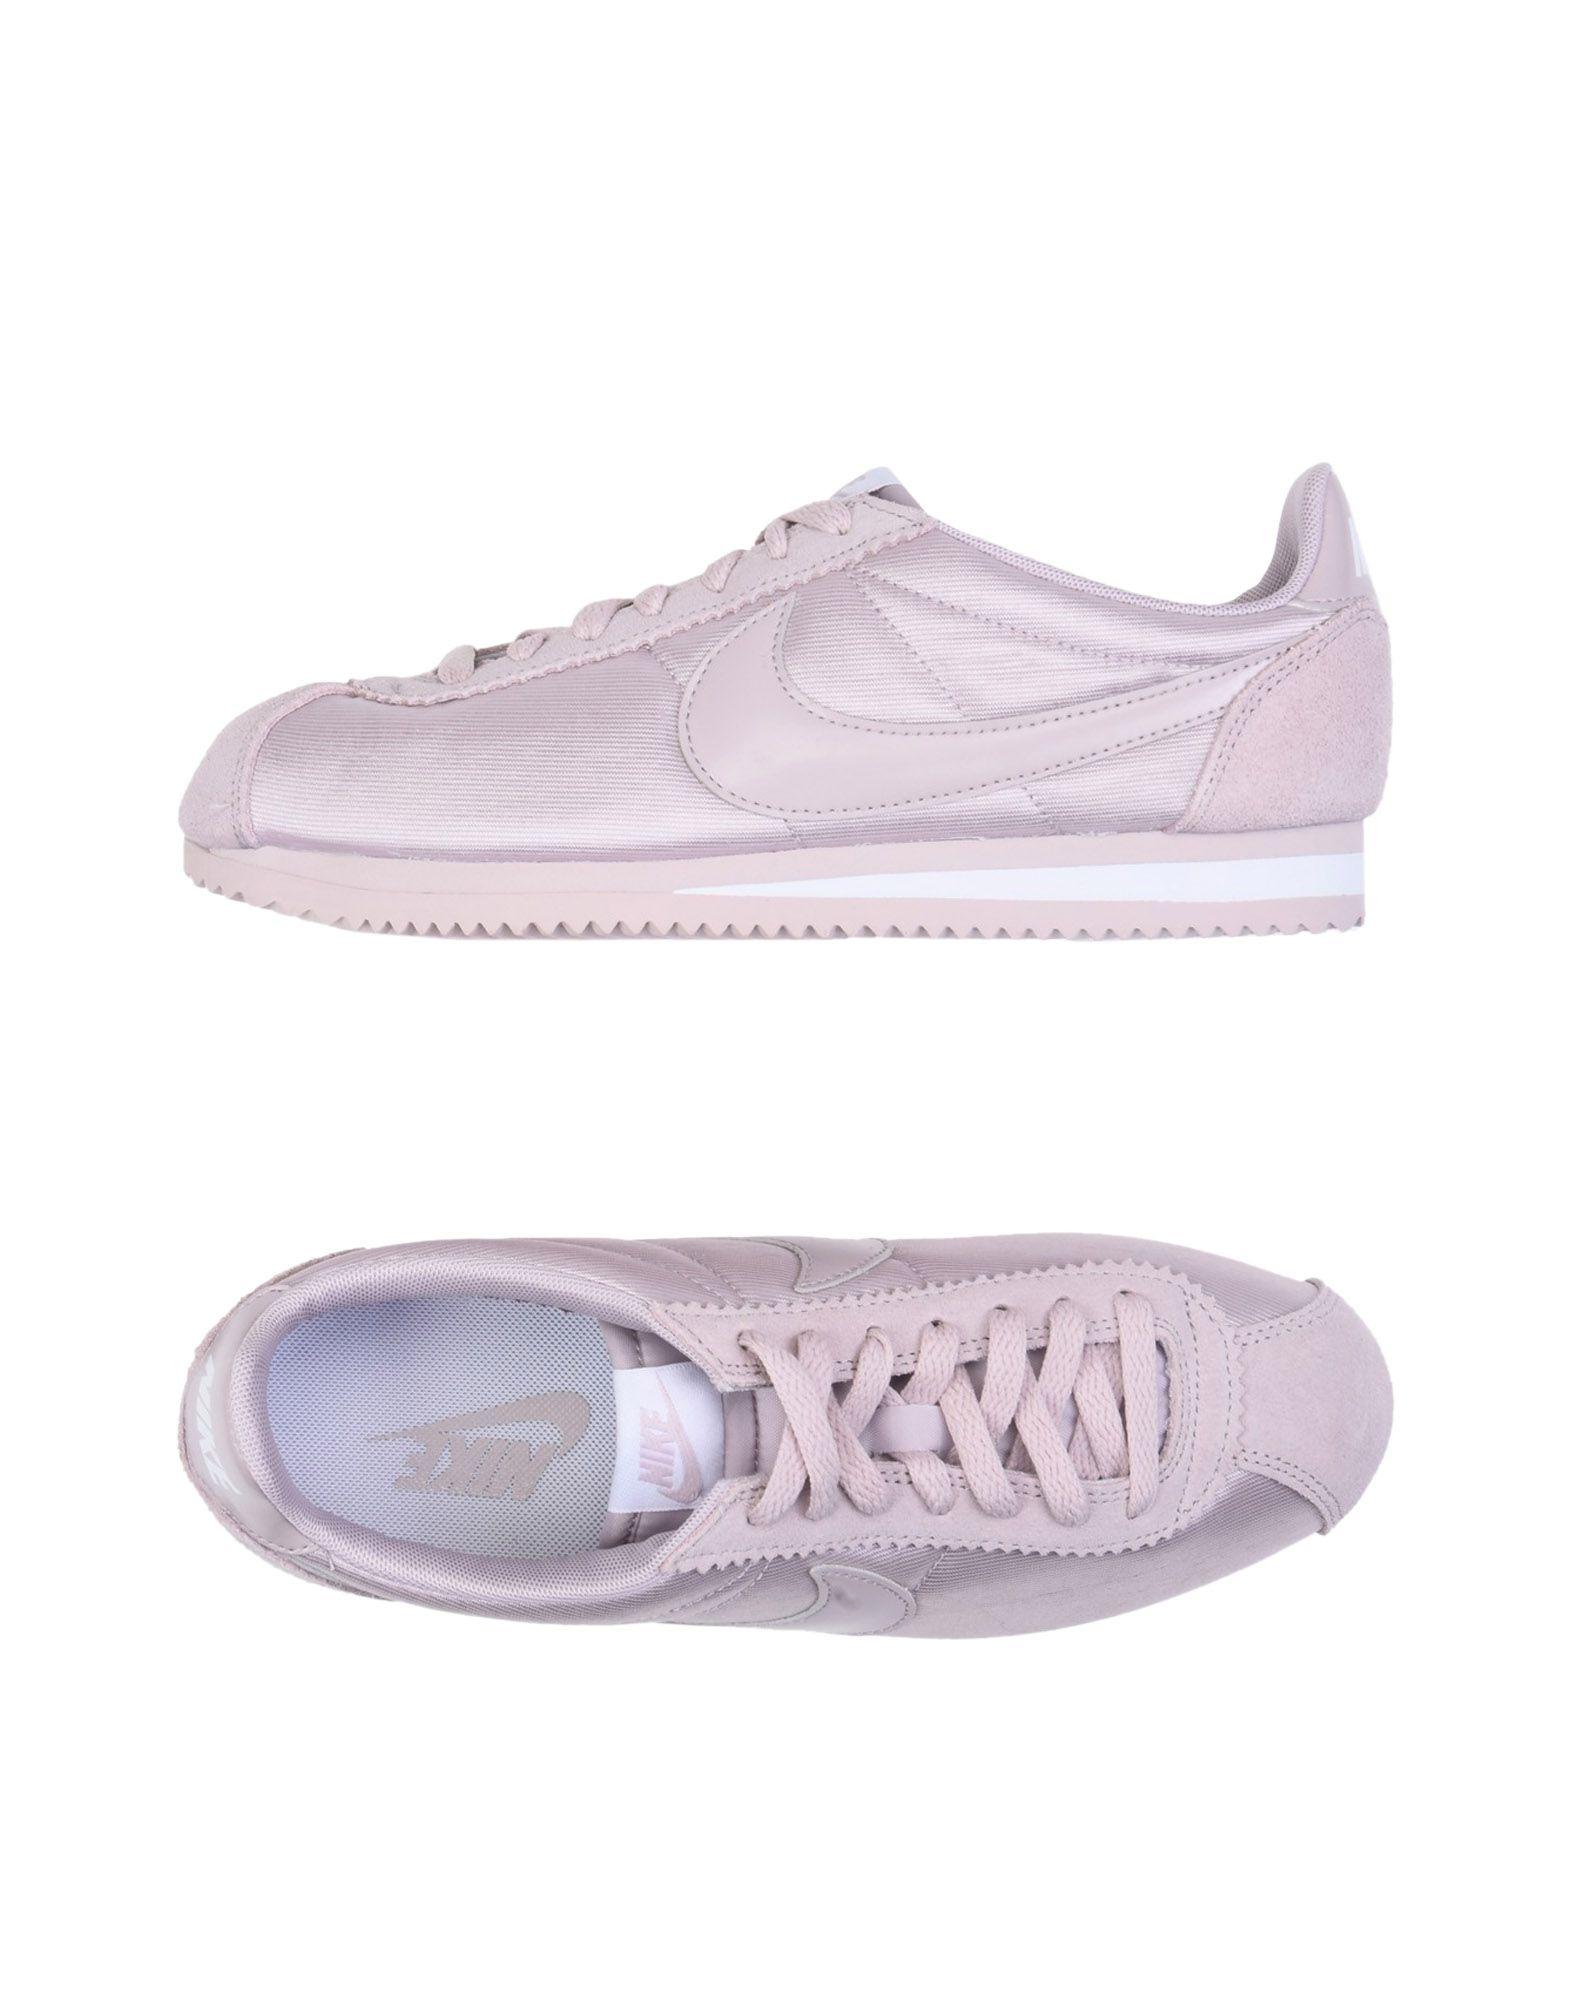 Scarpe da Cortez Ginnastica Nike  Classic Cortez da Nylon - Donna - 11511139GI 9c2dc0